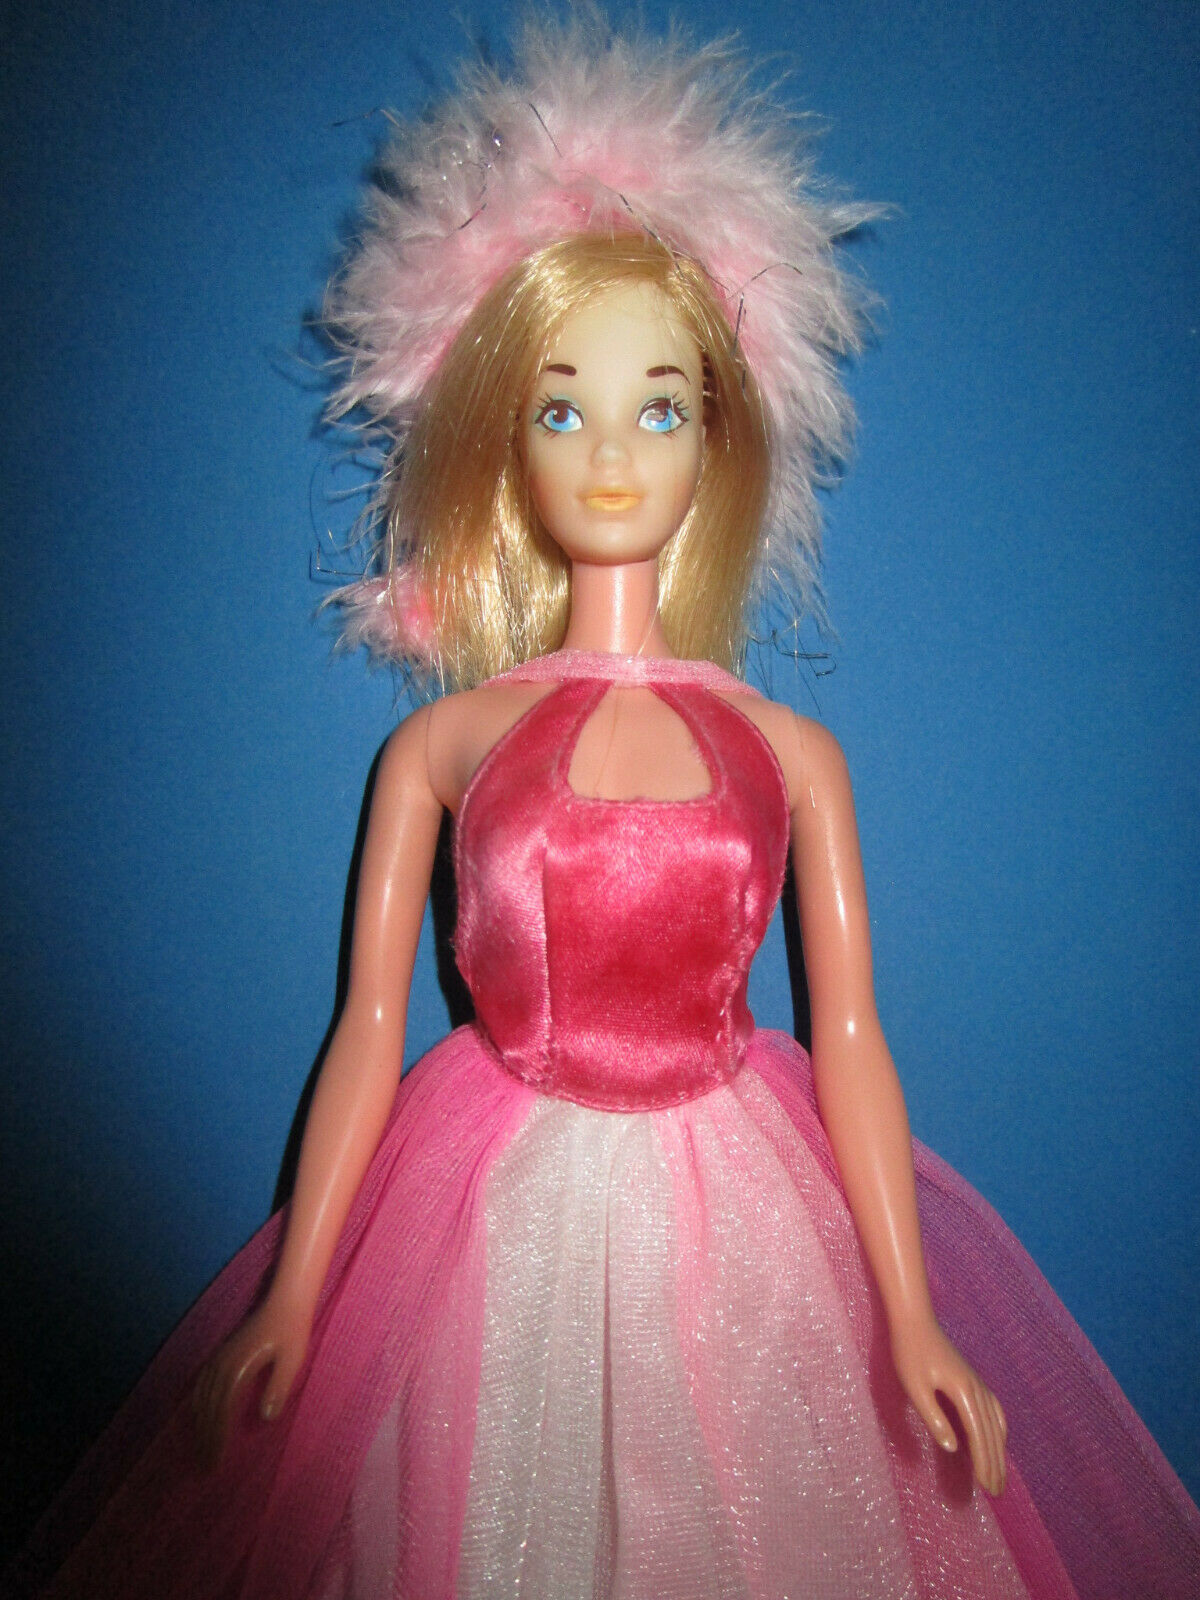 B630) vieja rubio vintage barbie mattel corea en el Beste buy vestido mattel 1977